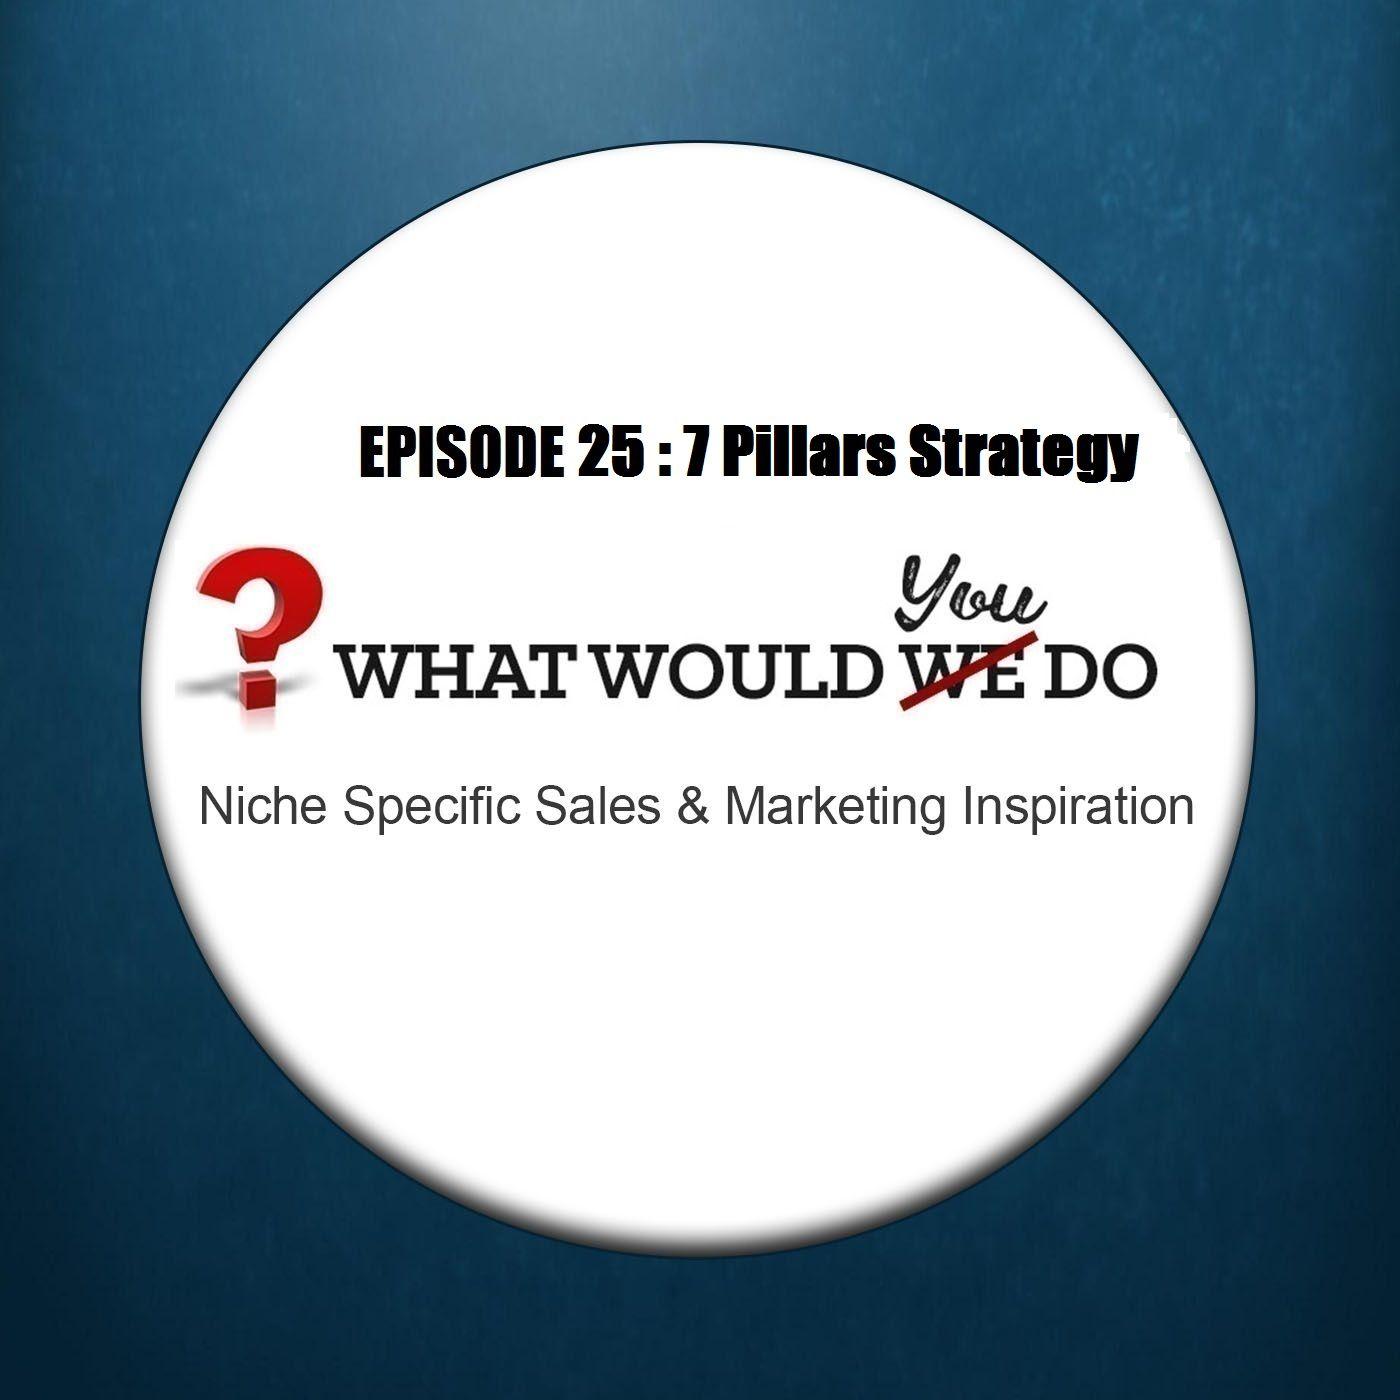 The 7 Pillars Strategy